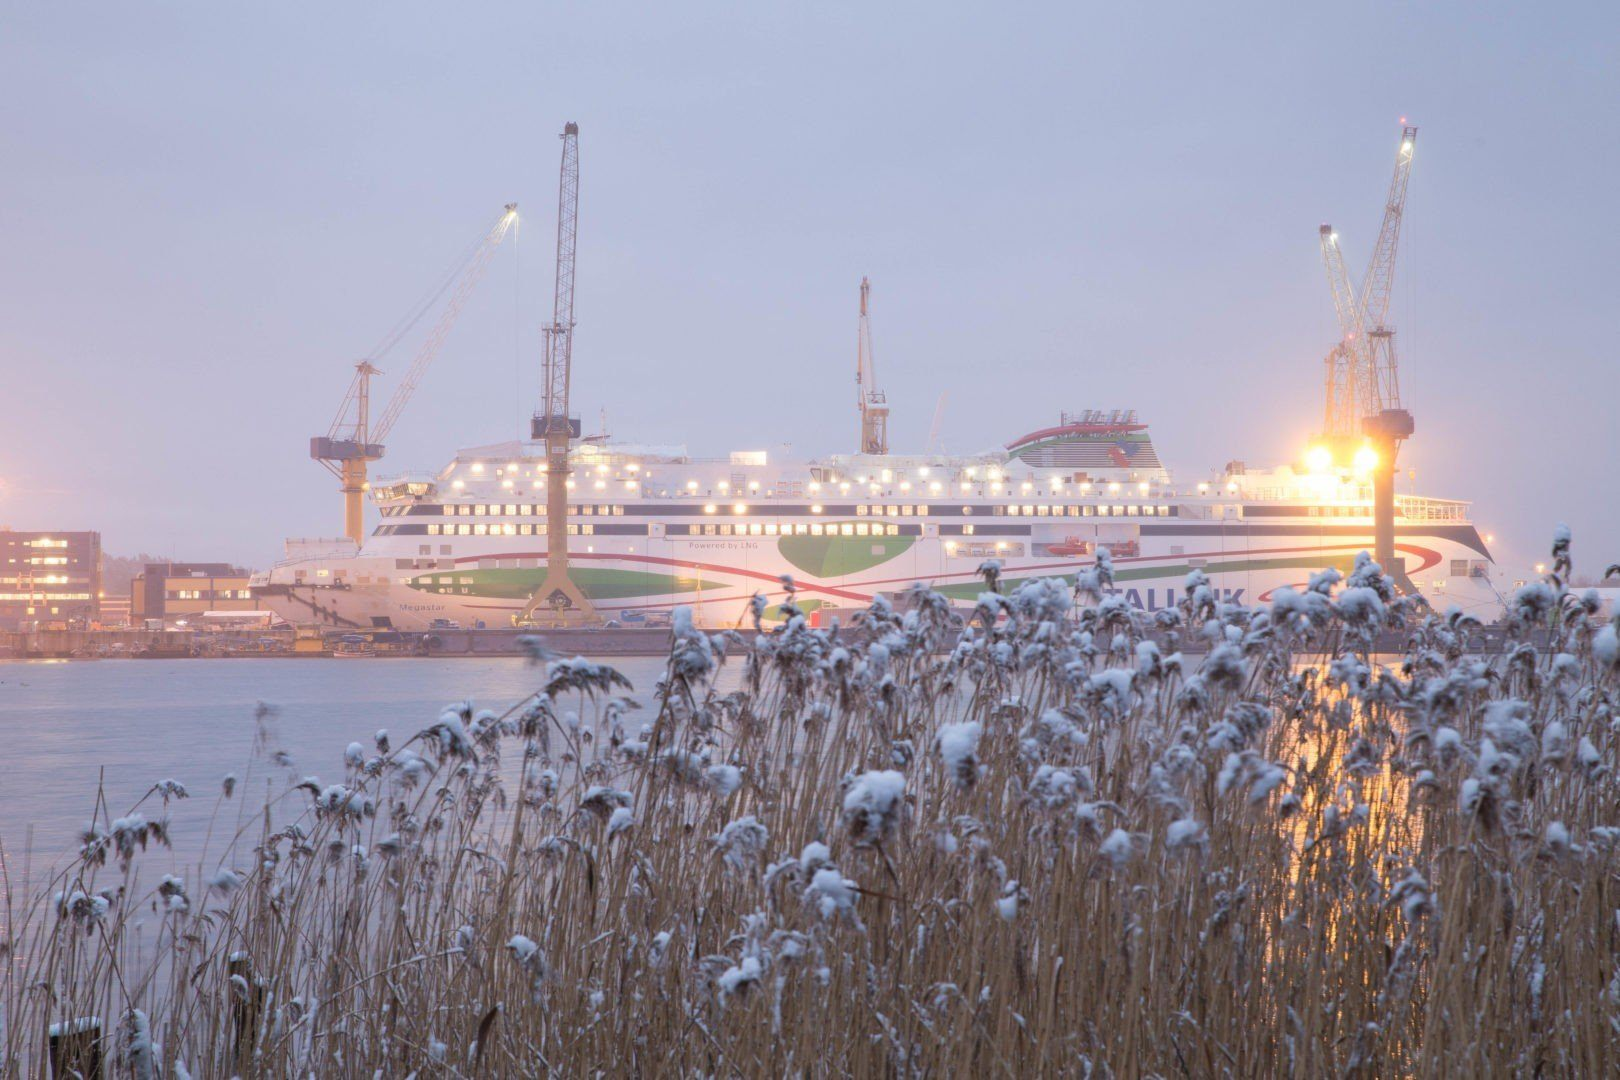 Megastar Tallink